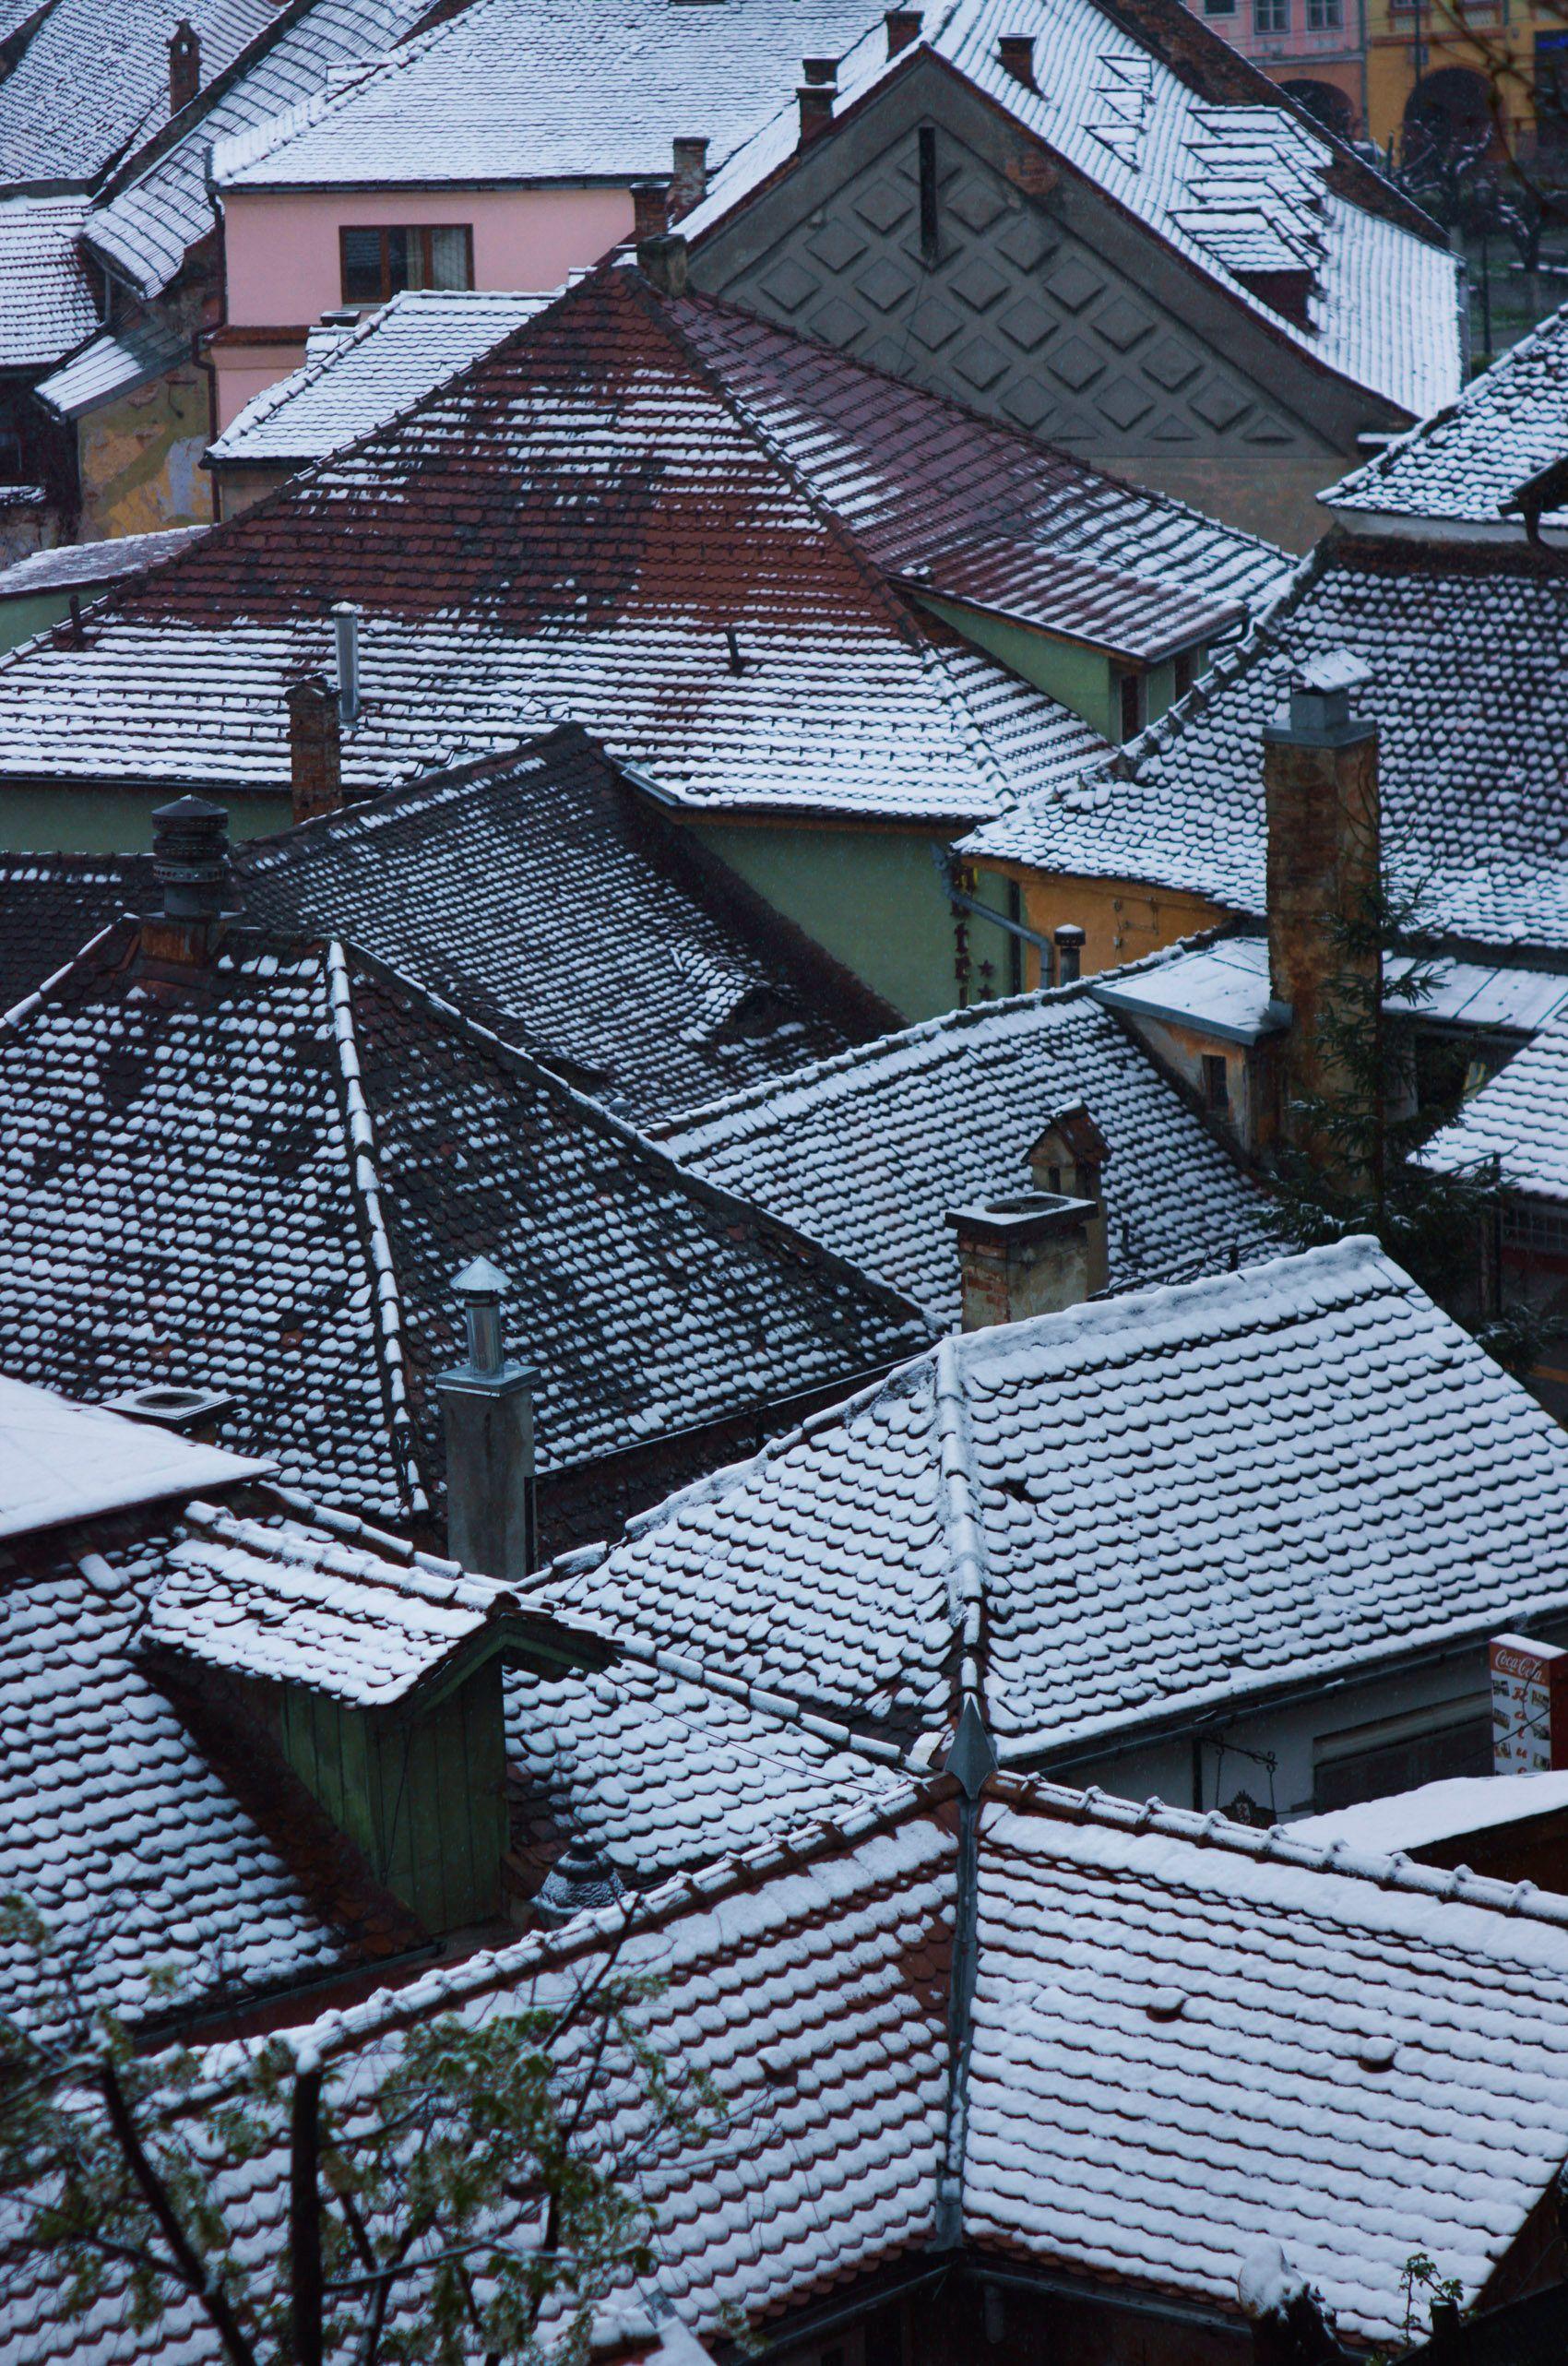 Dusted Rooftops, Sigisoara